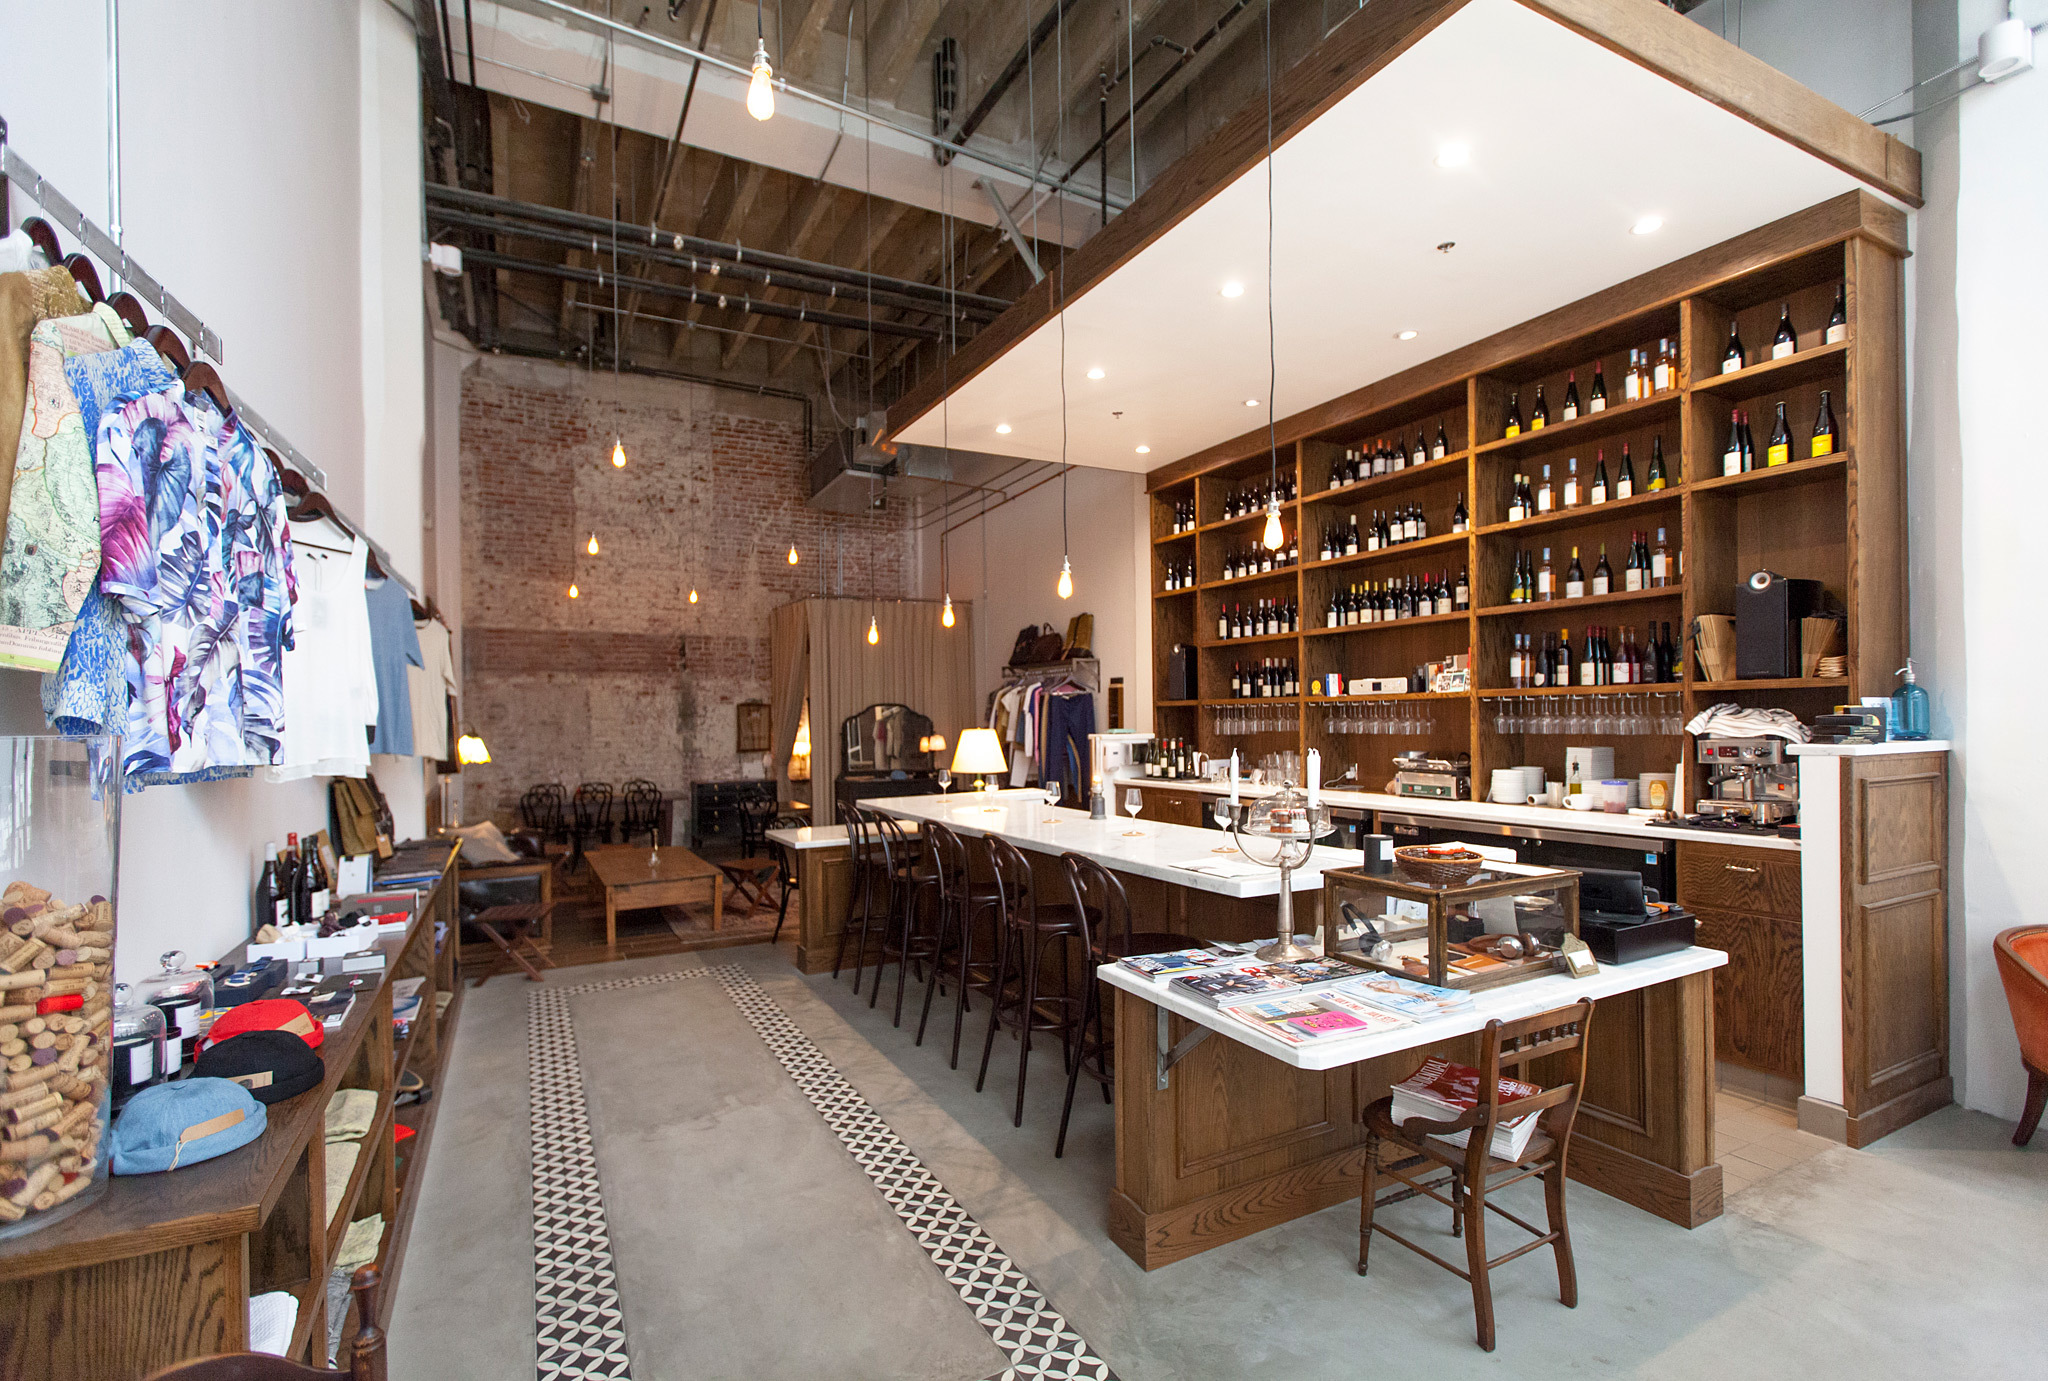 Bar review: Garçons de Café